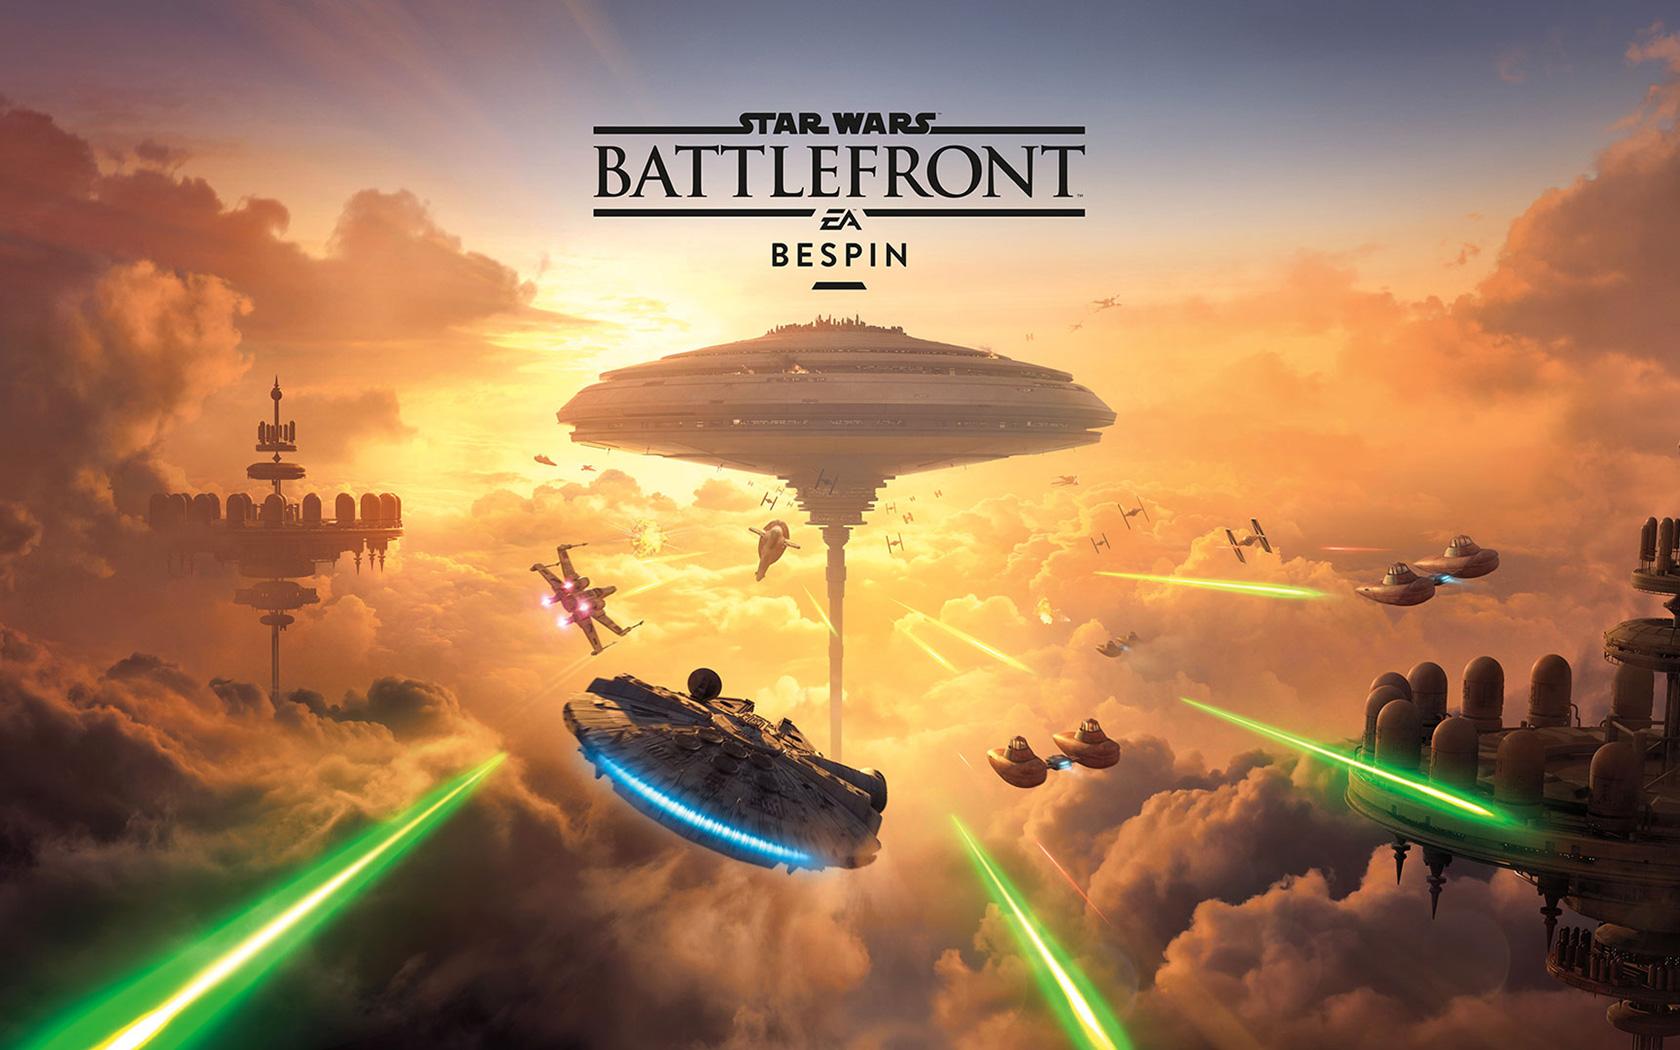 Free Star Wars: Battlefront Wallpaper in 1680x1050